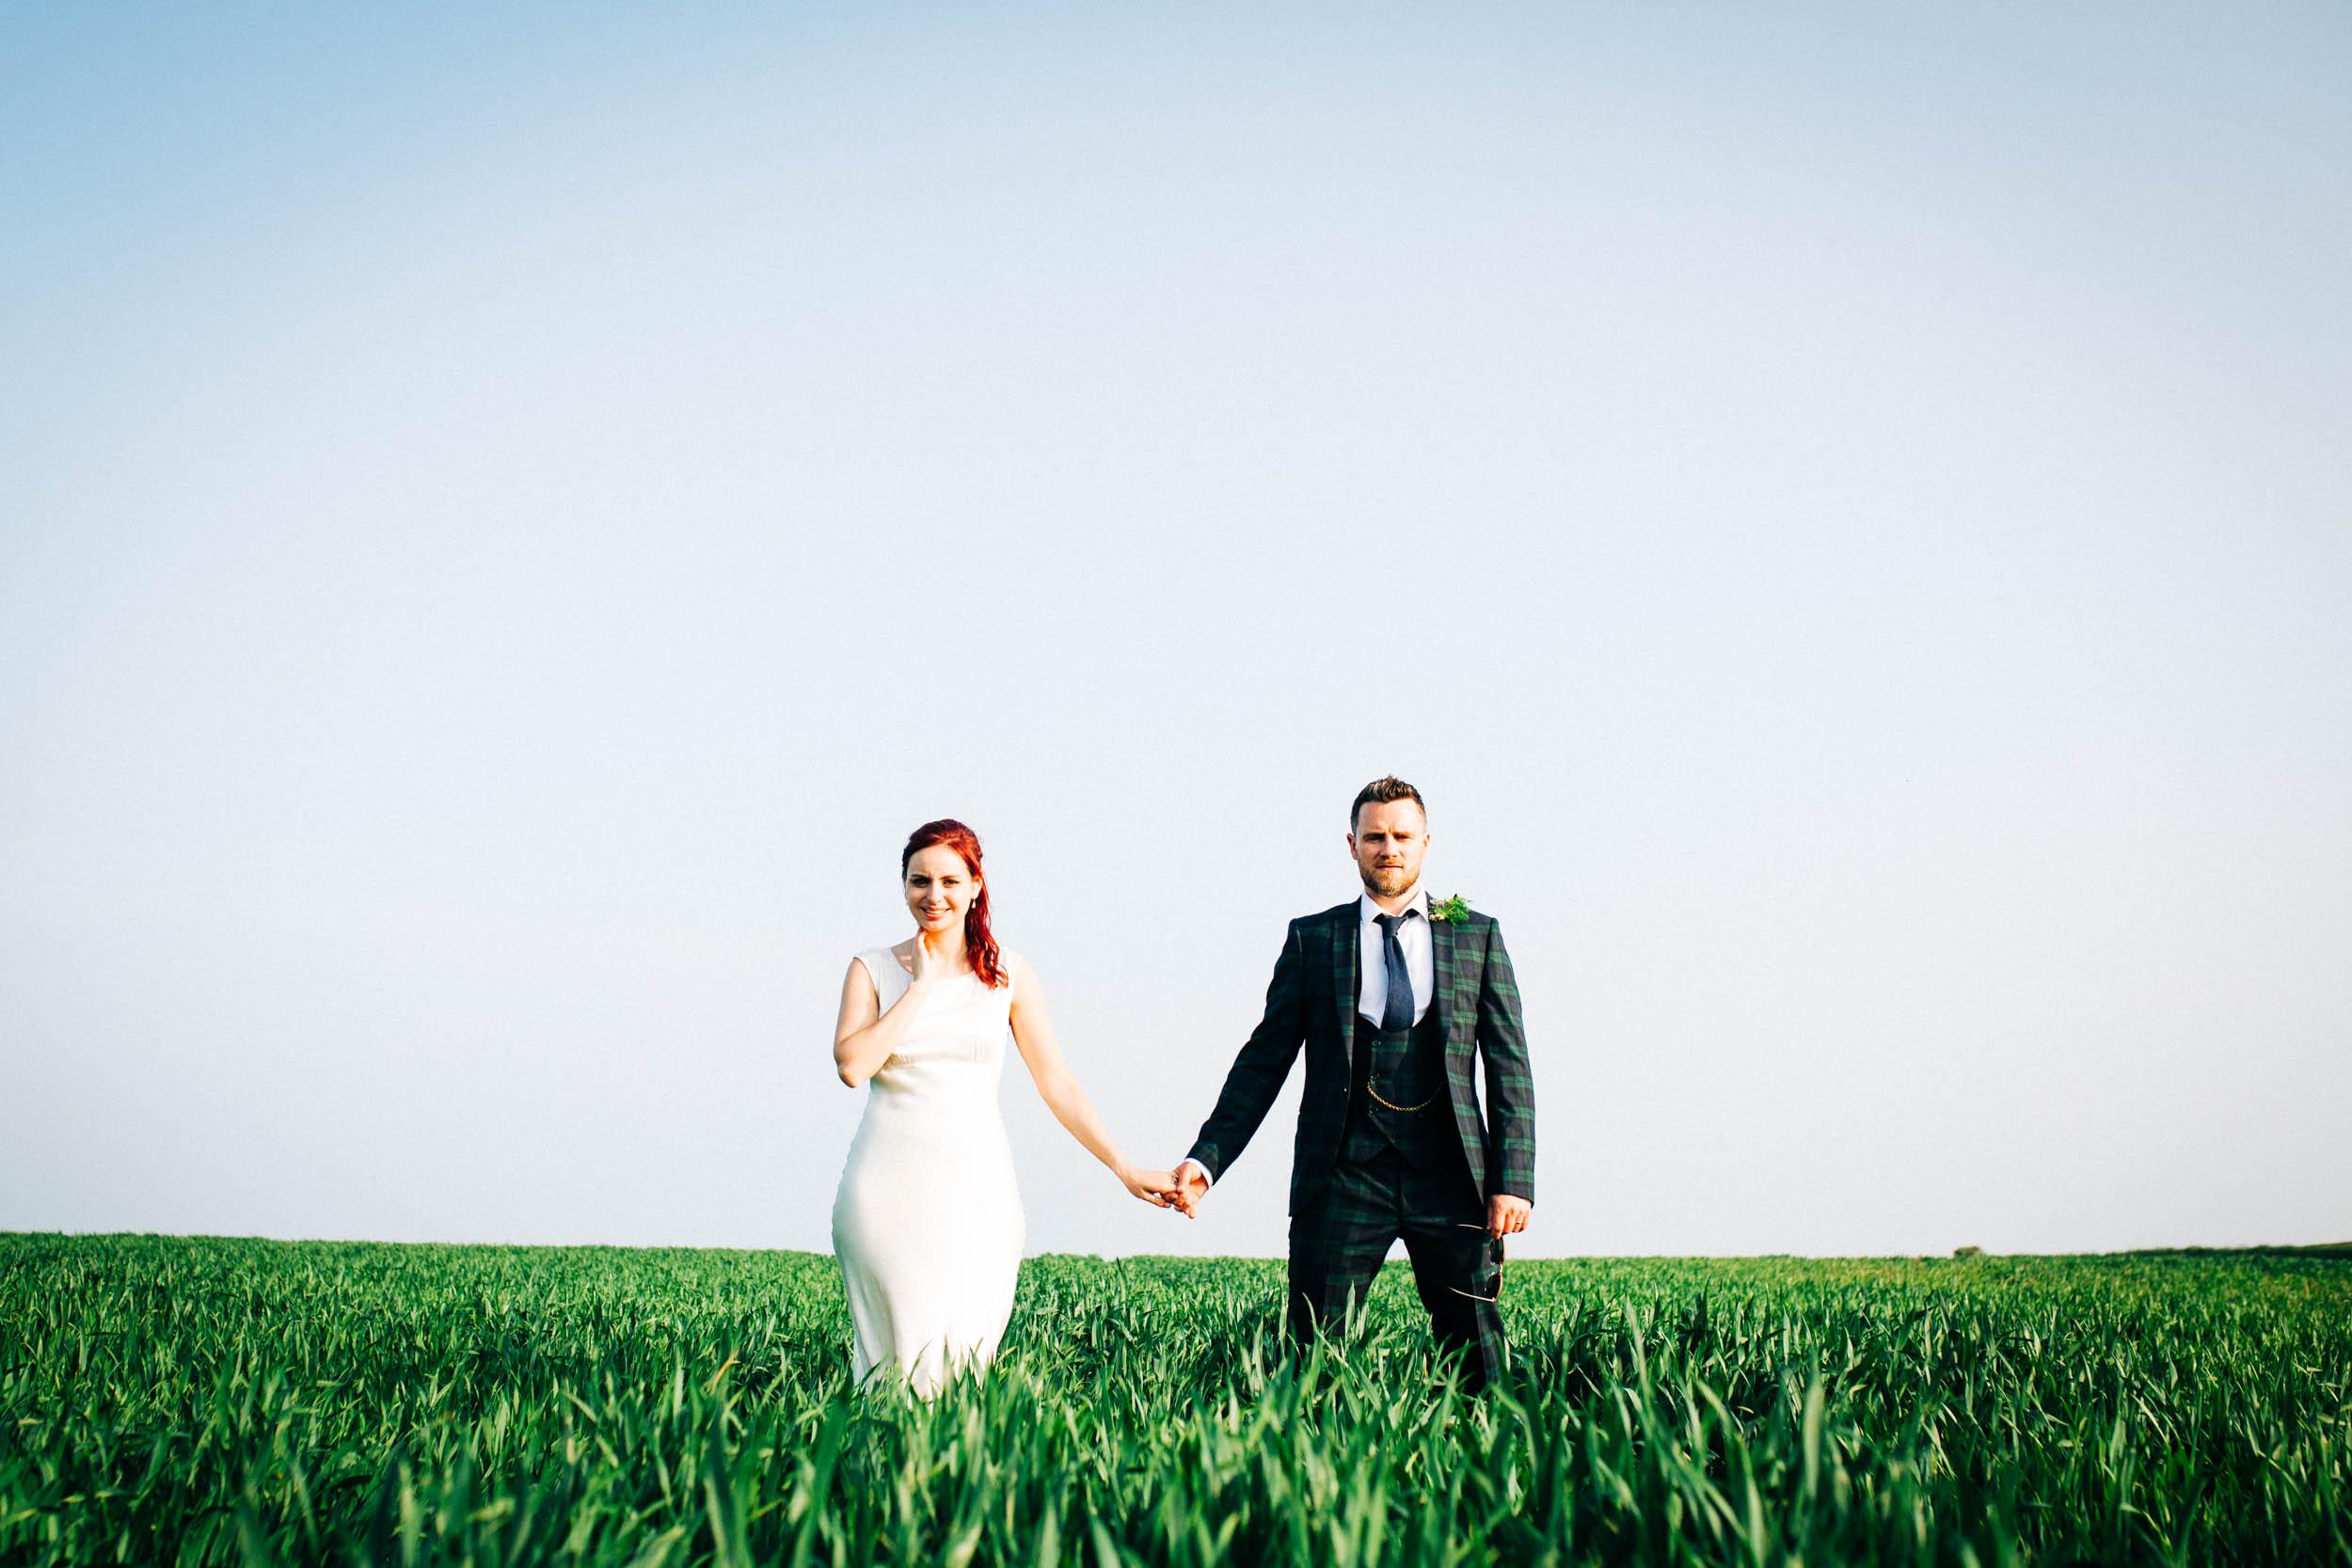 Alex_Sedgmond_Photography-SouthWalesWeddingPhotography-Wedding-Photographer-Cardiff-147.jpg